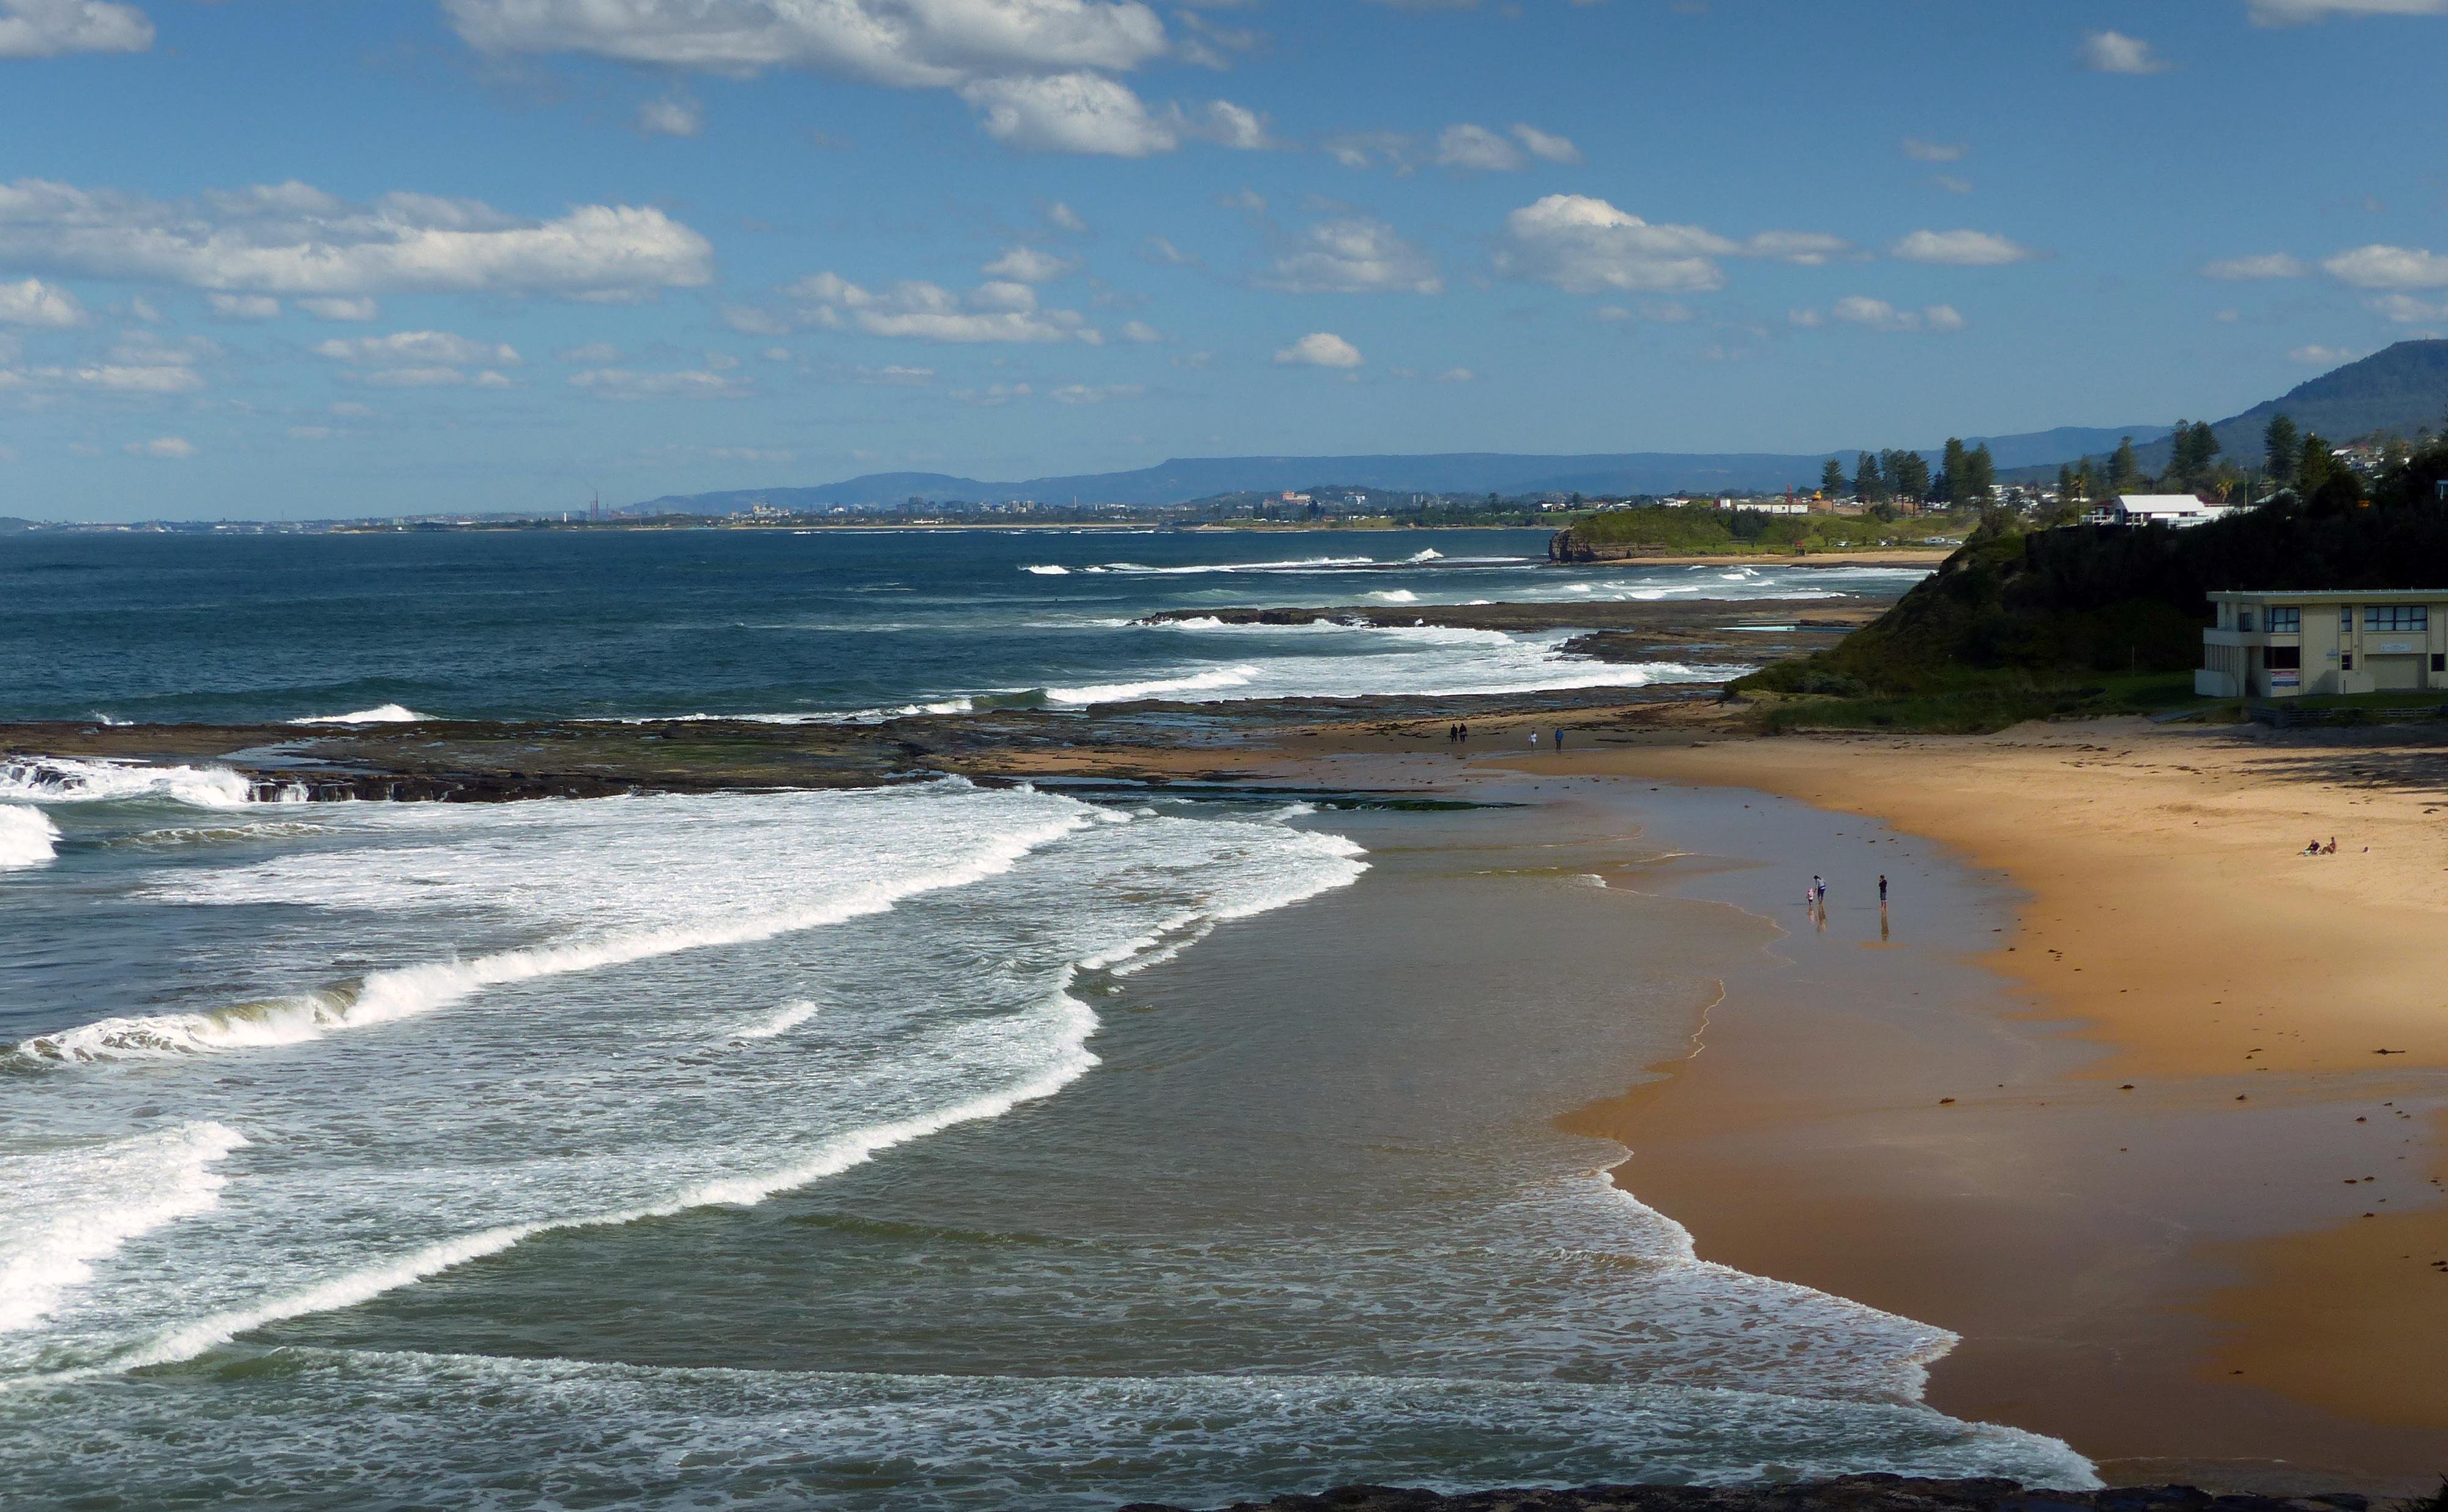 Nsw coastline. australia. photo